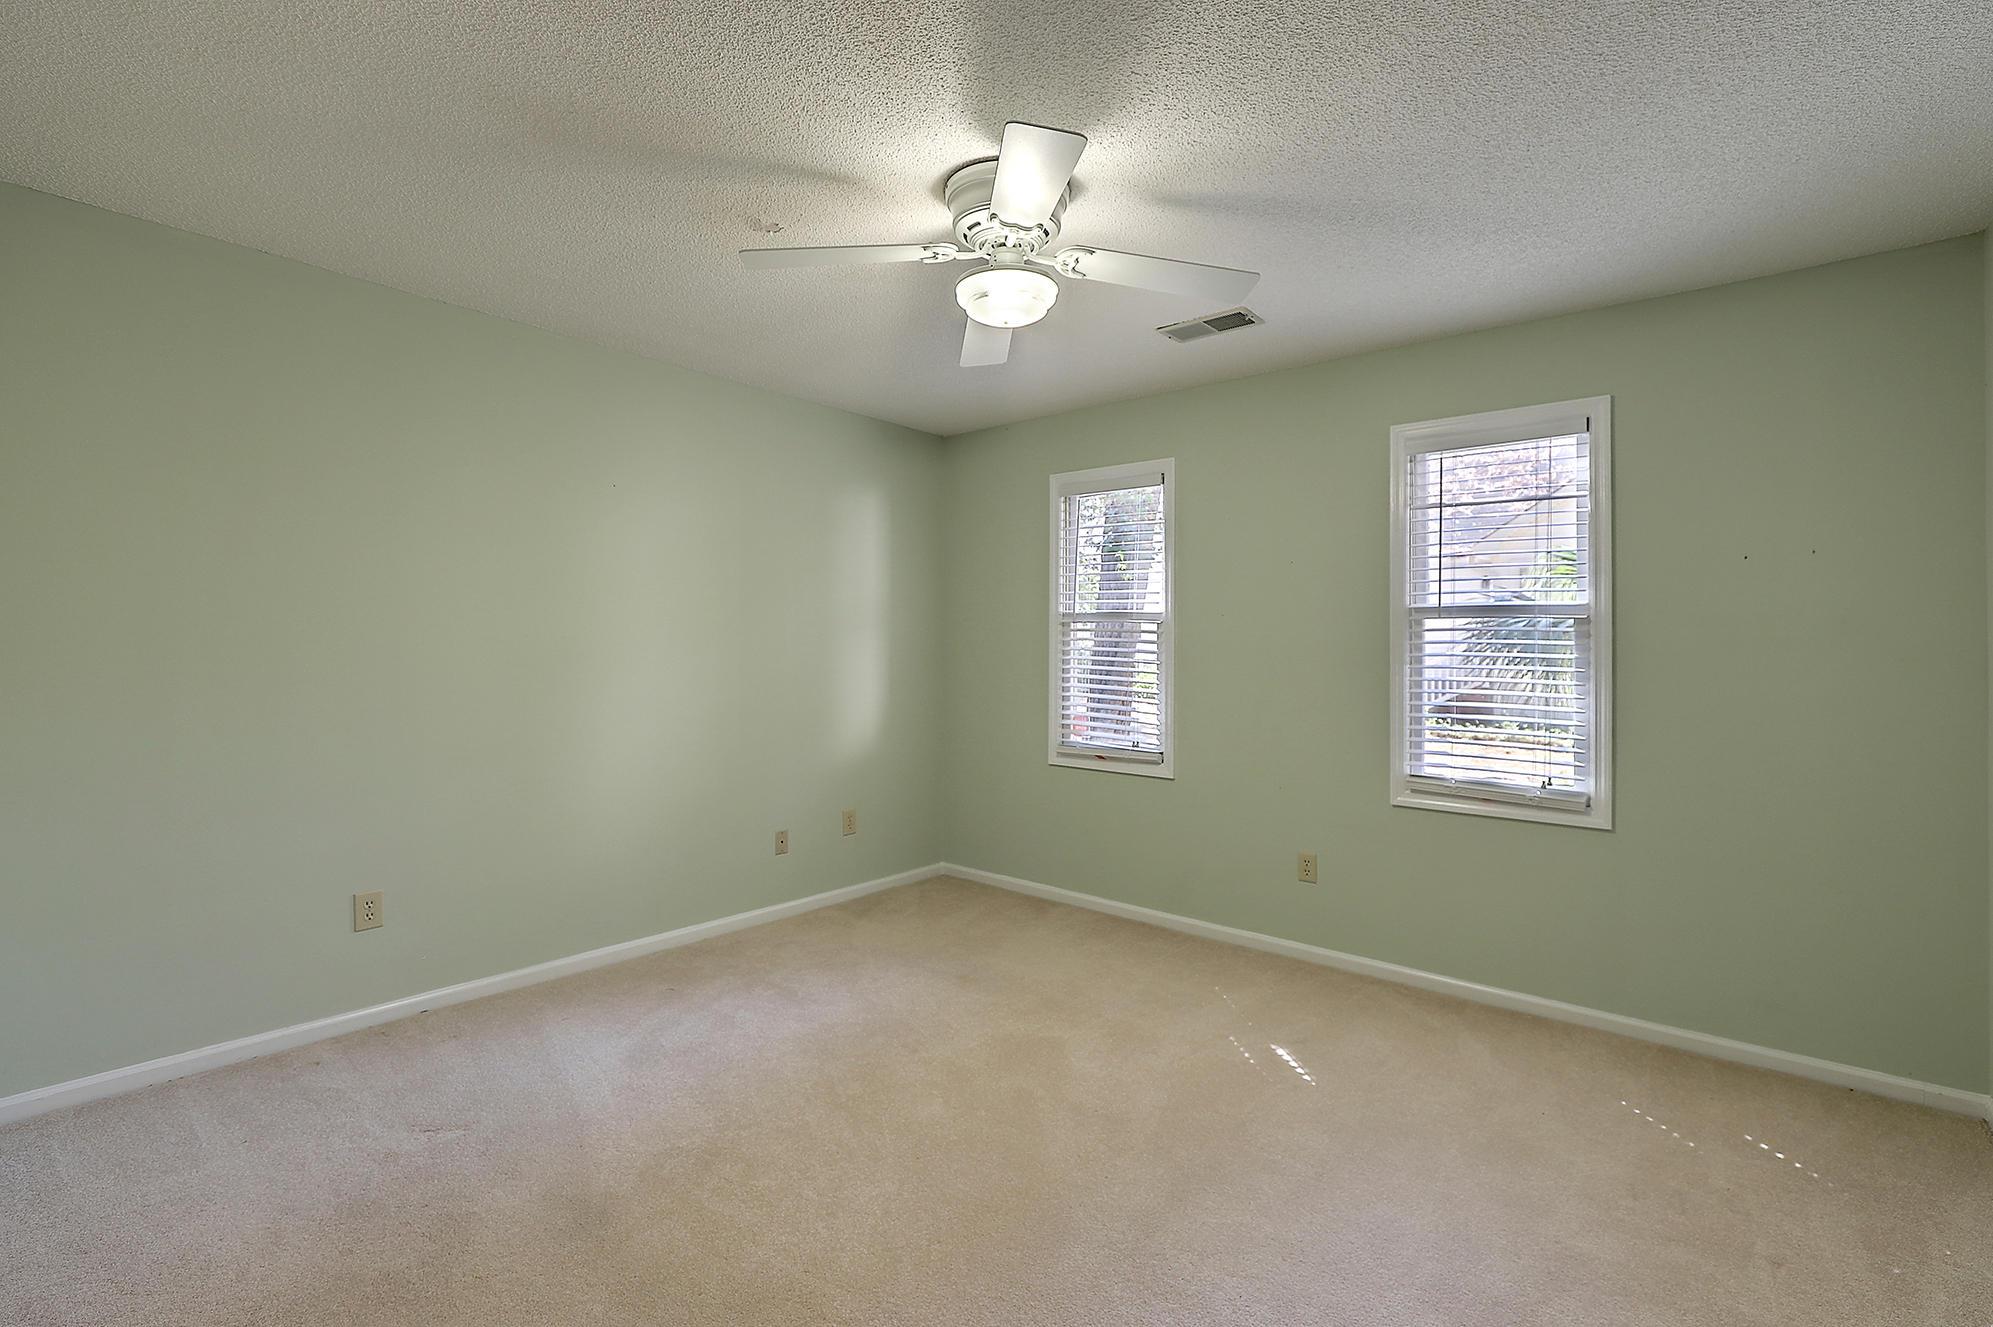 Elms of Charleston Homes For Sale - 9121 Lafayette, North Charleston, SC - 0